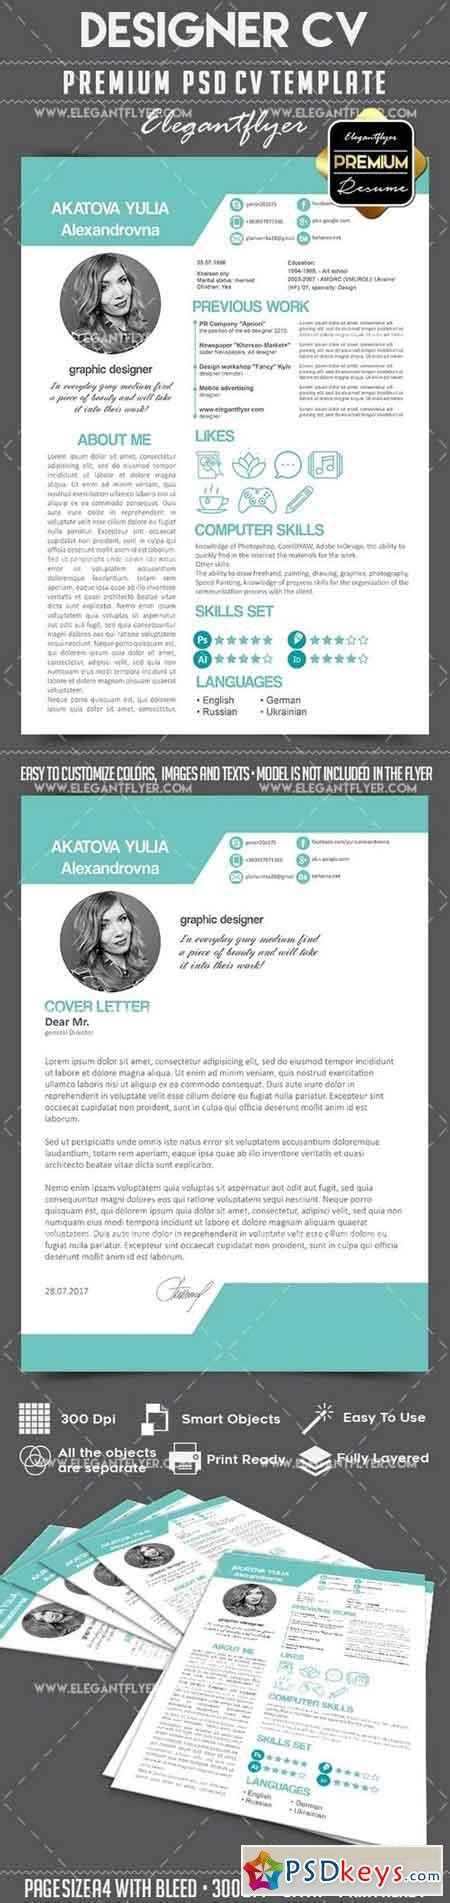 resume psd template rar cv premium cv and cover letter psd template 187 free photoshop vector stock image via